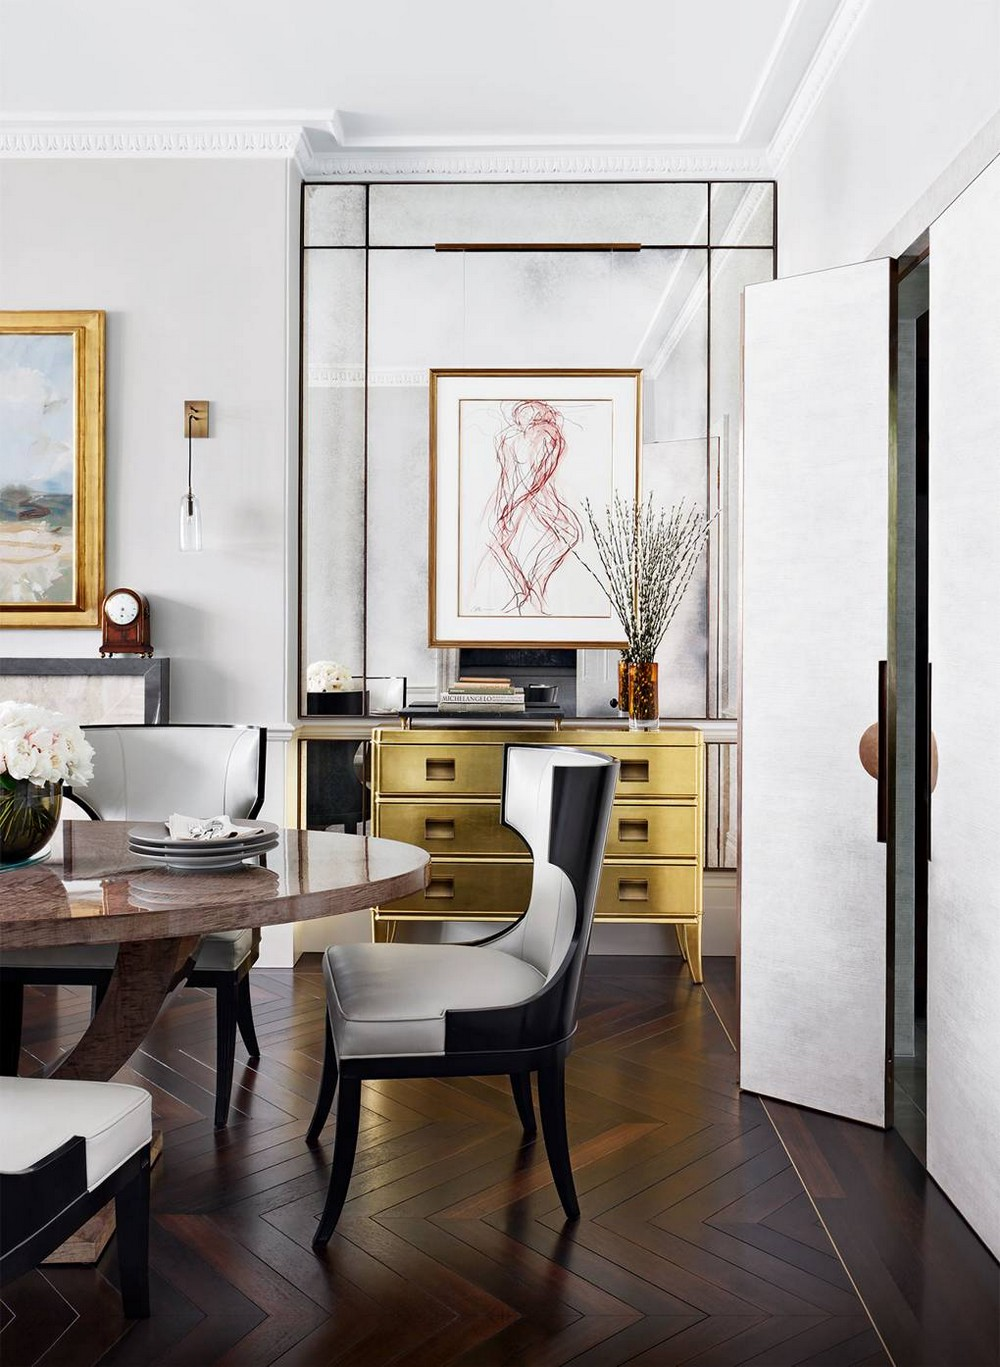 Luxury Interior Design Today: Dining Room Projects by Janine Stone janine stone Luxury Interior Design Today: Dining Room Projects by Janine Stone 4 house garden